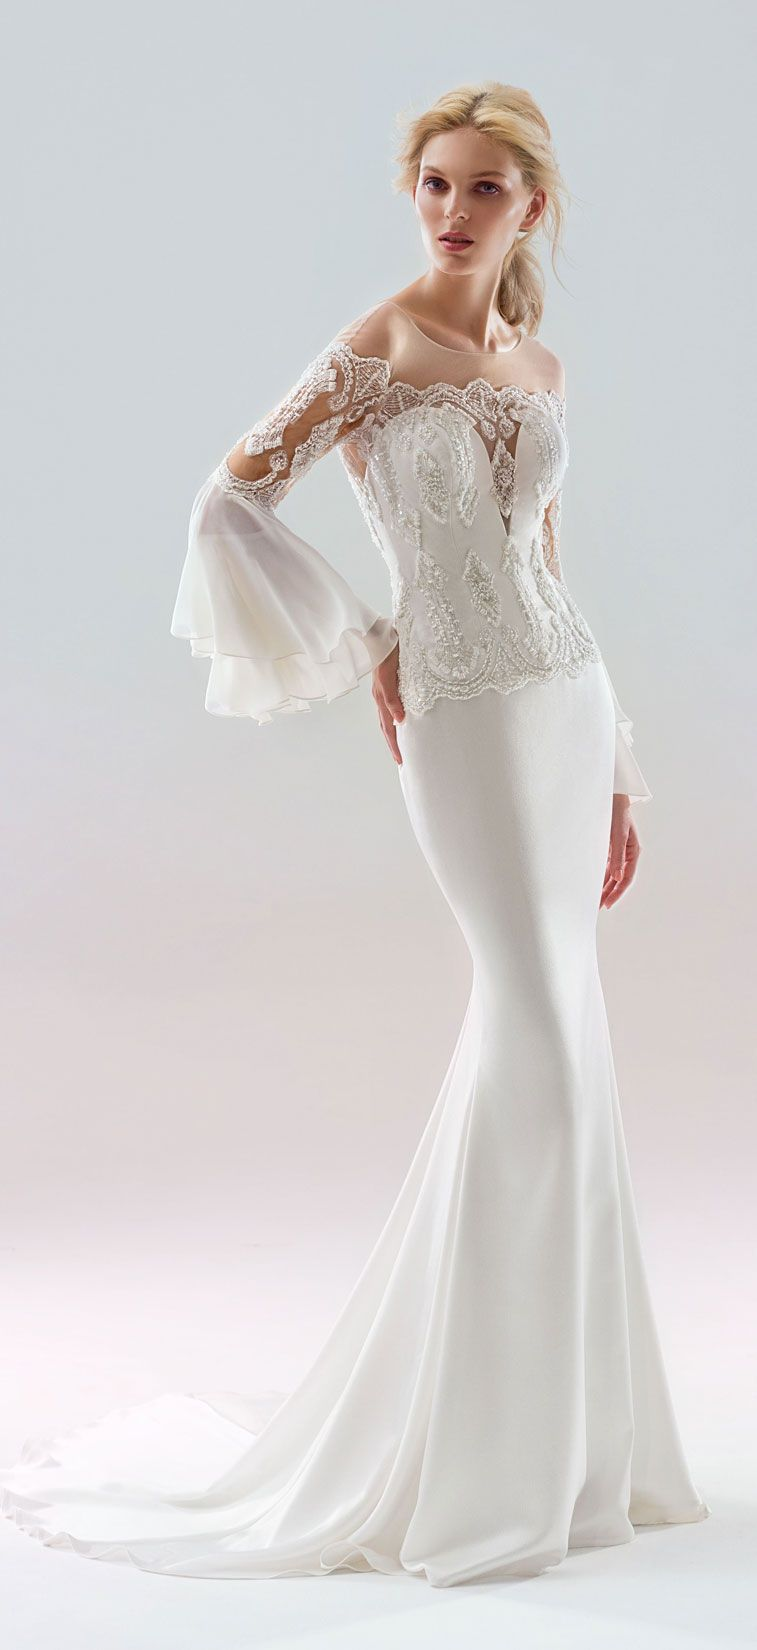 Papilio Wedding Dresses – White Wind Bridal Collection